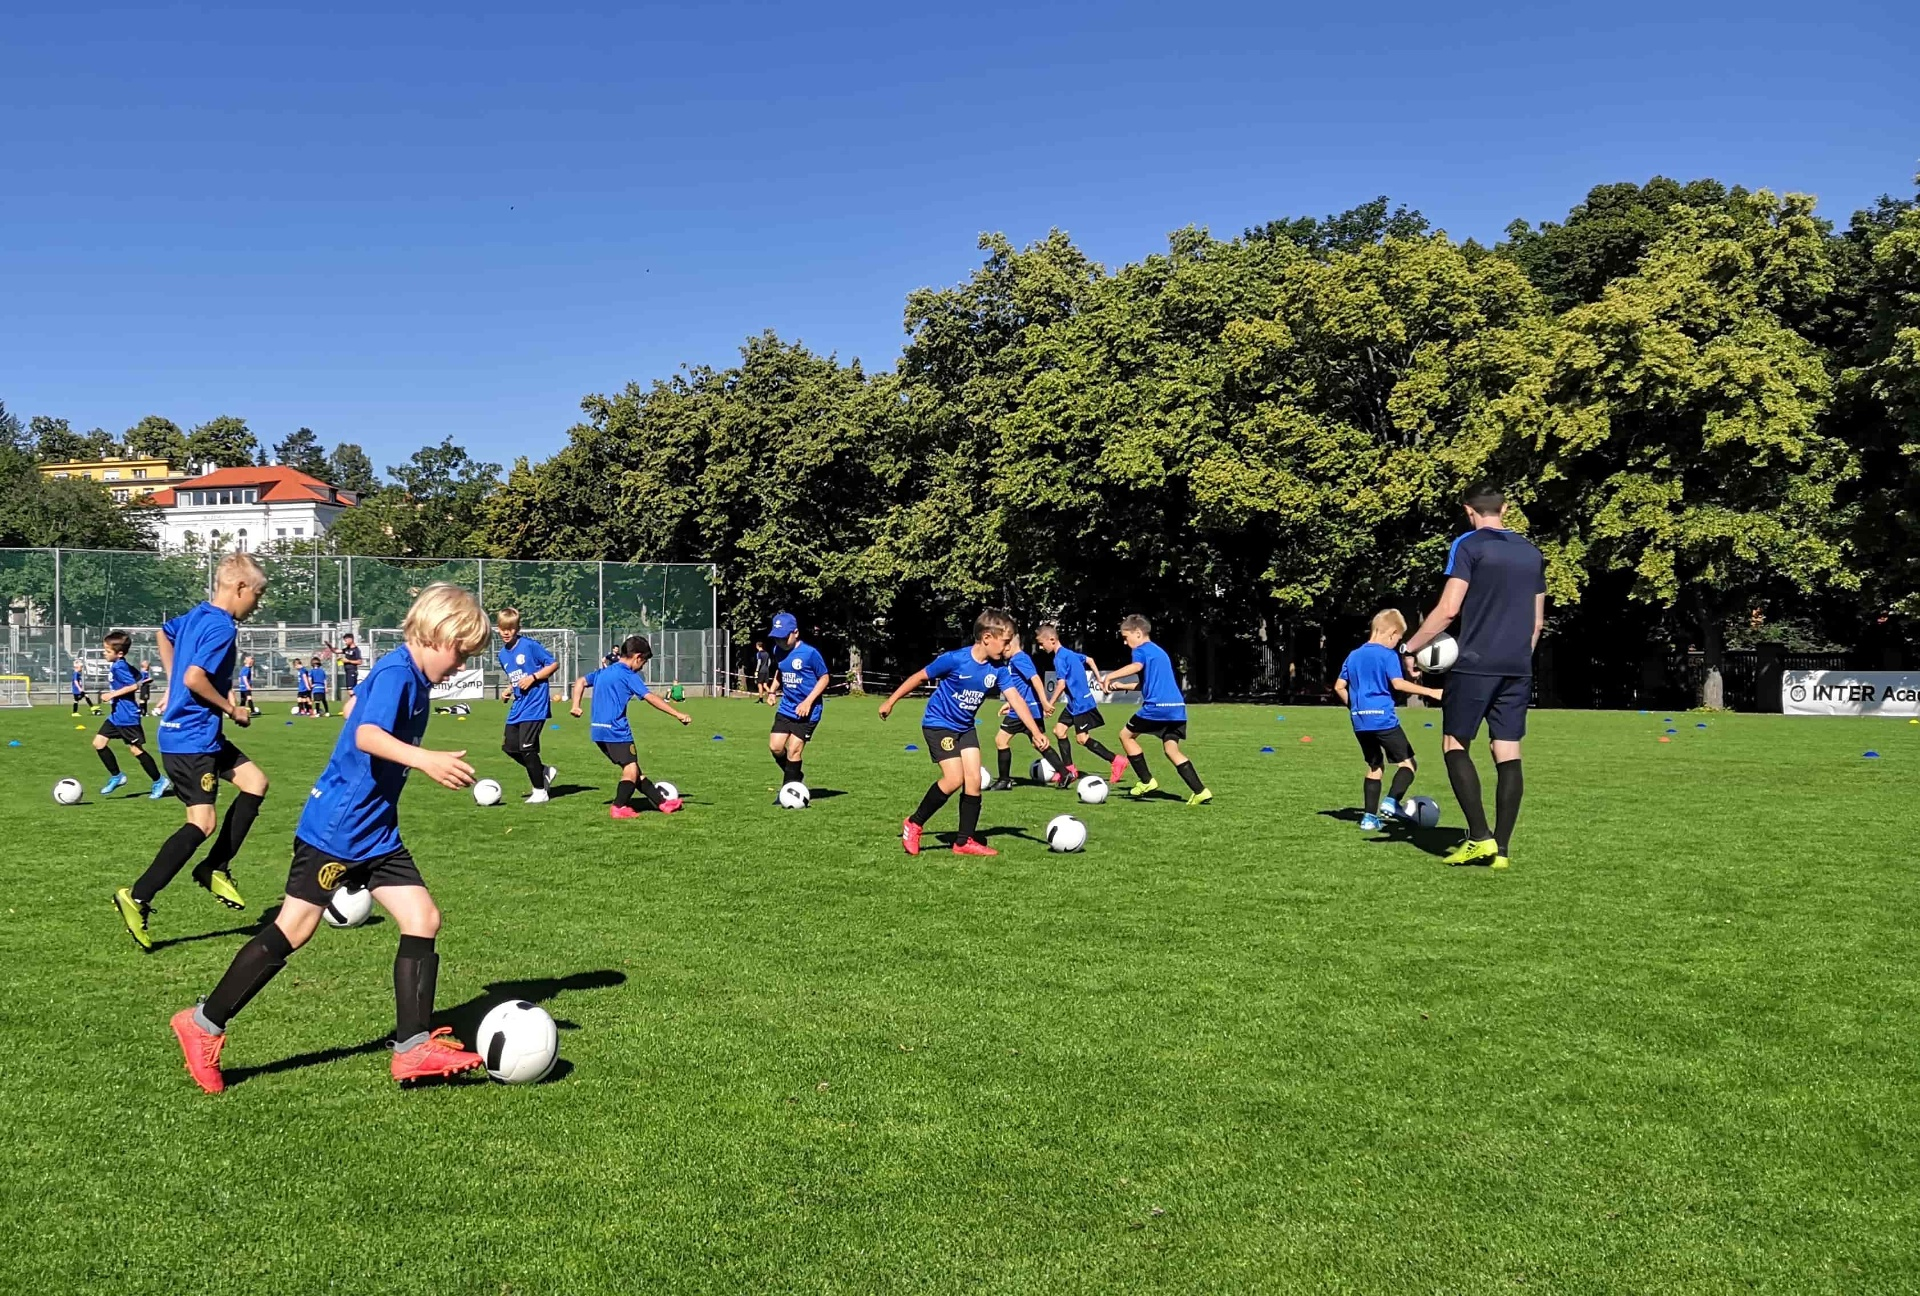 Inter Academy 3